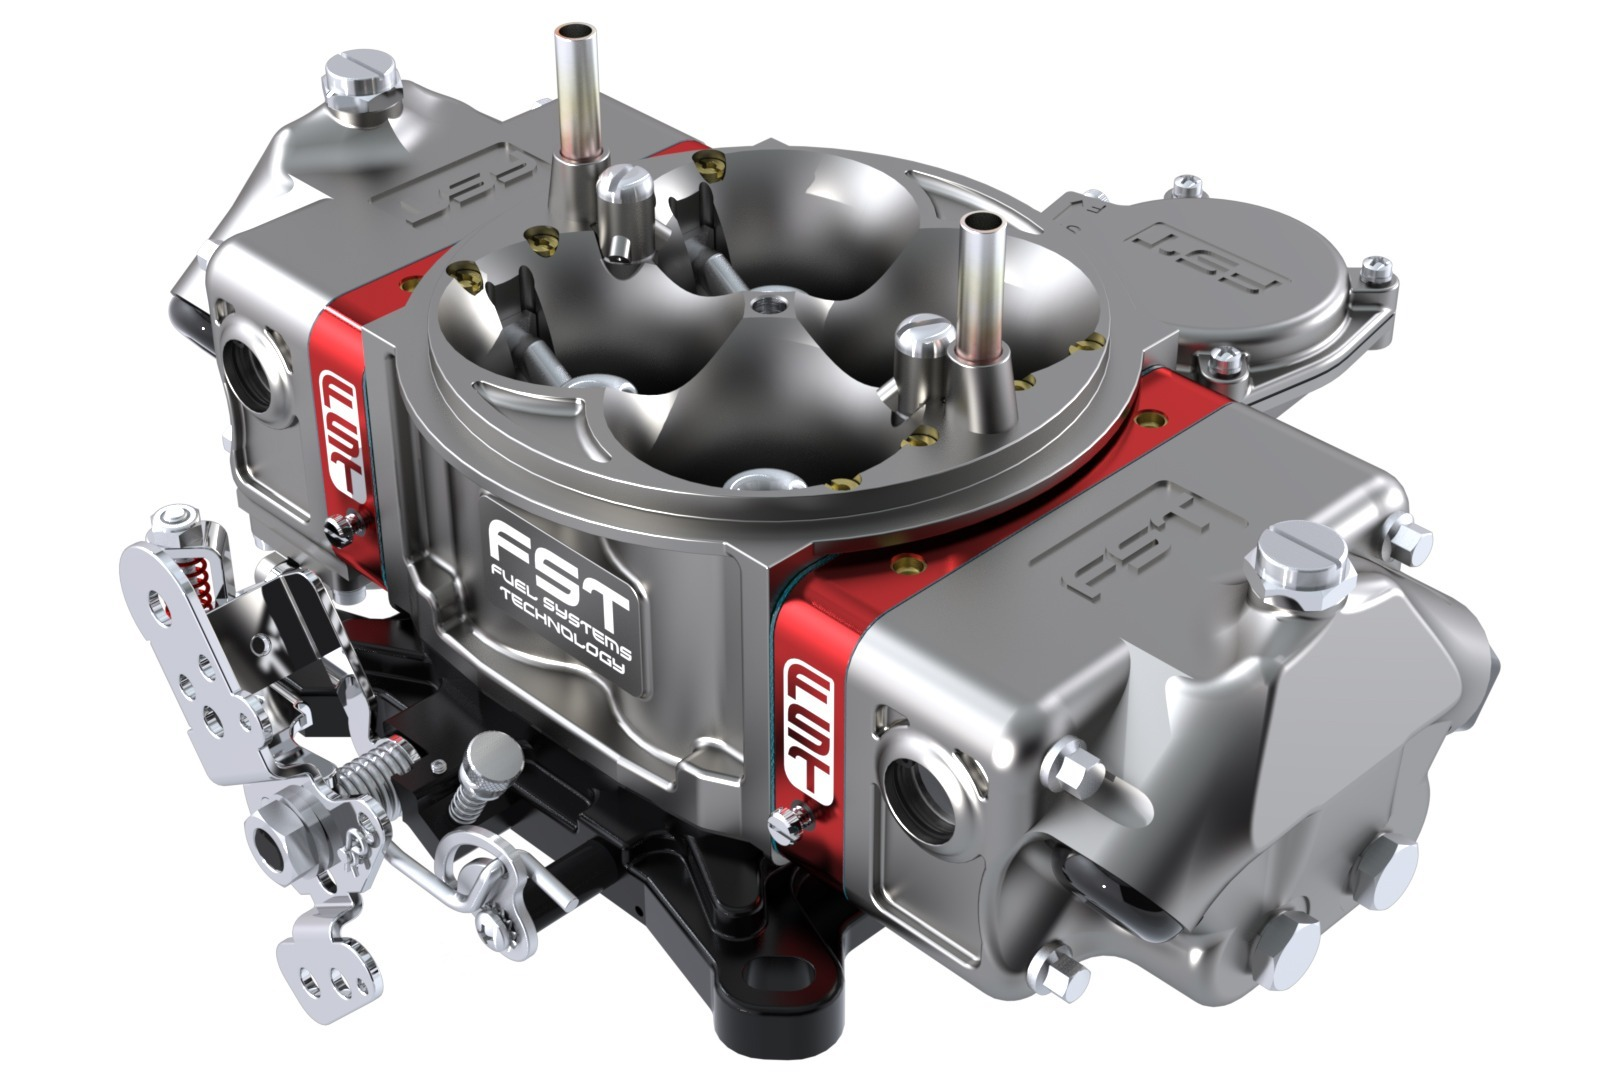 FST Performance Carburetor 41750B Carburetor, Billet X-treme, 4-Barrel, 750 CFM, Square Bore, Vacuum Secondary, Dual Inlet, Titanium Anodize, Each